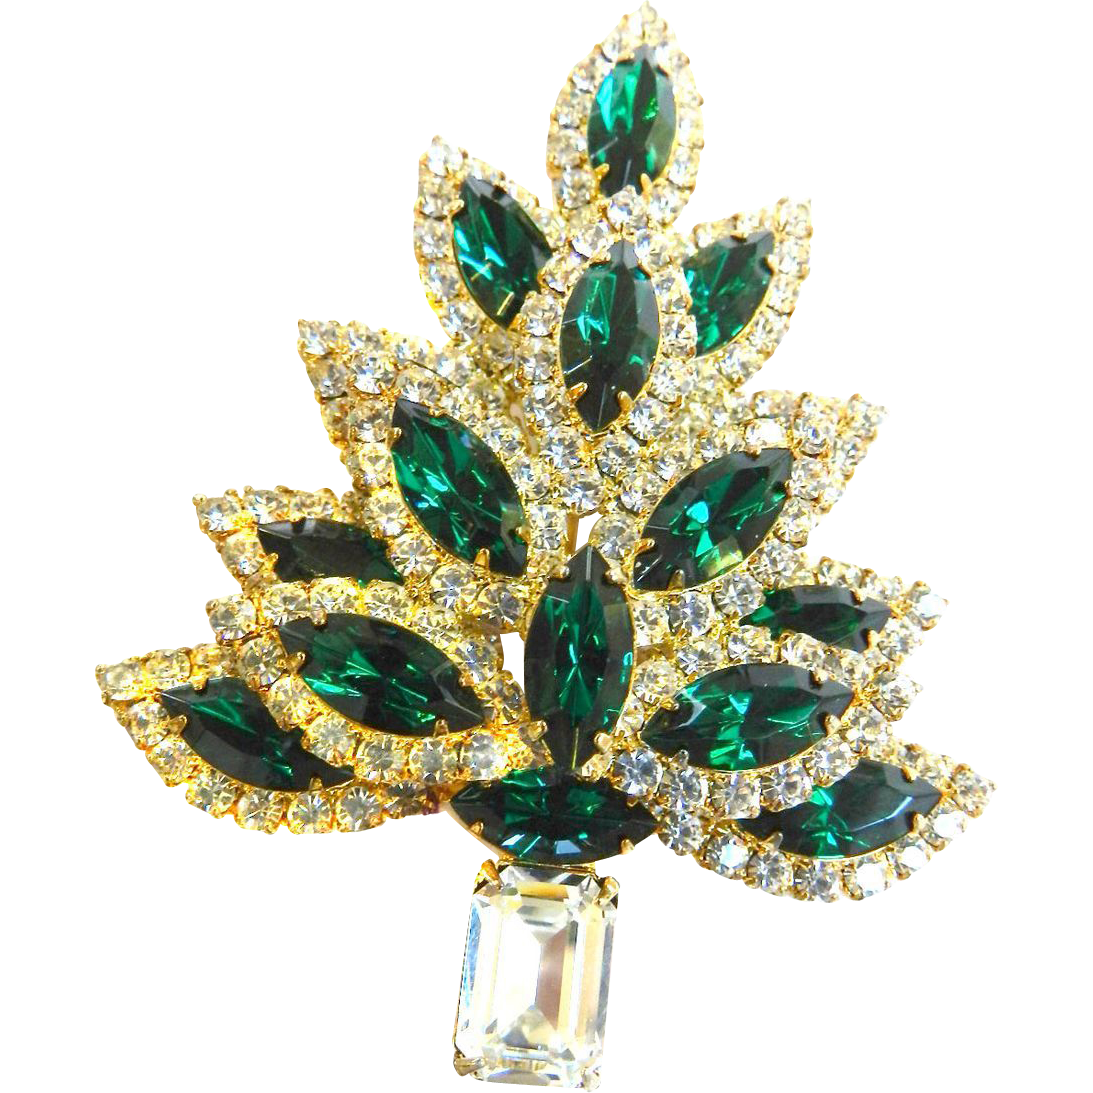 Exquisite Dazzling Massive Emerald Rhinestone Xmas Tree Brooch